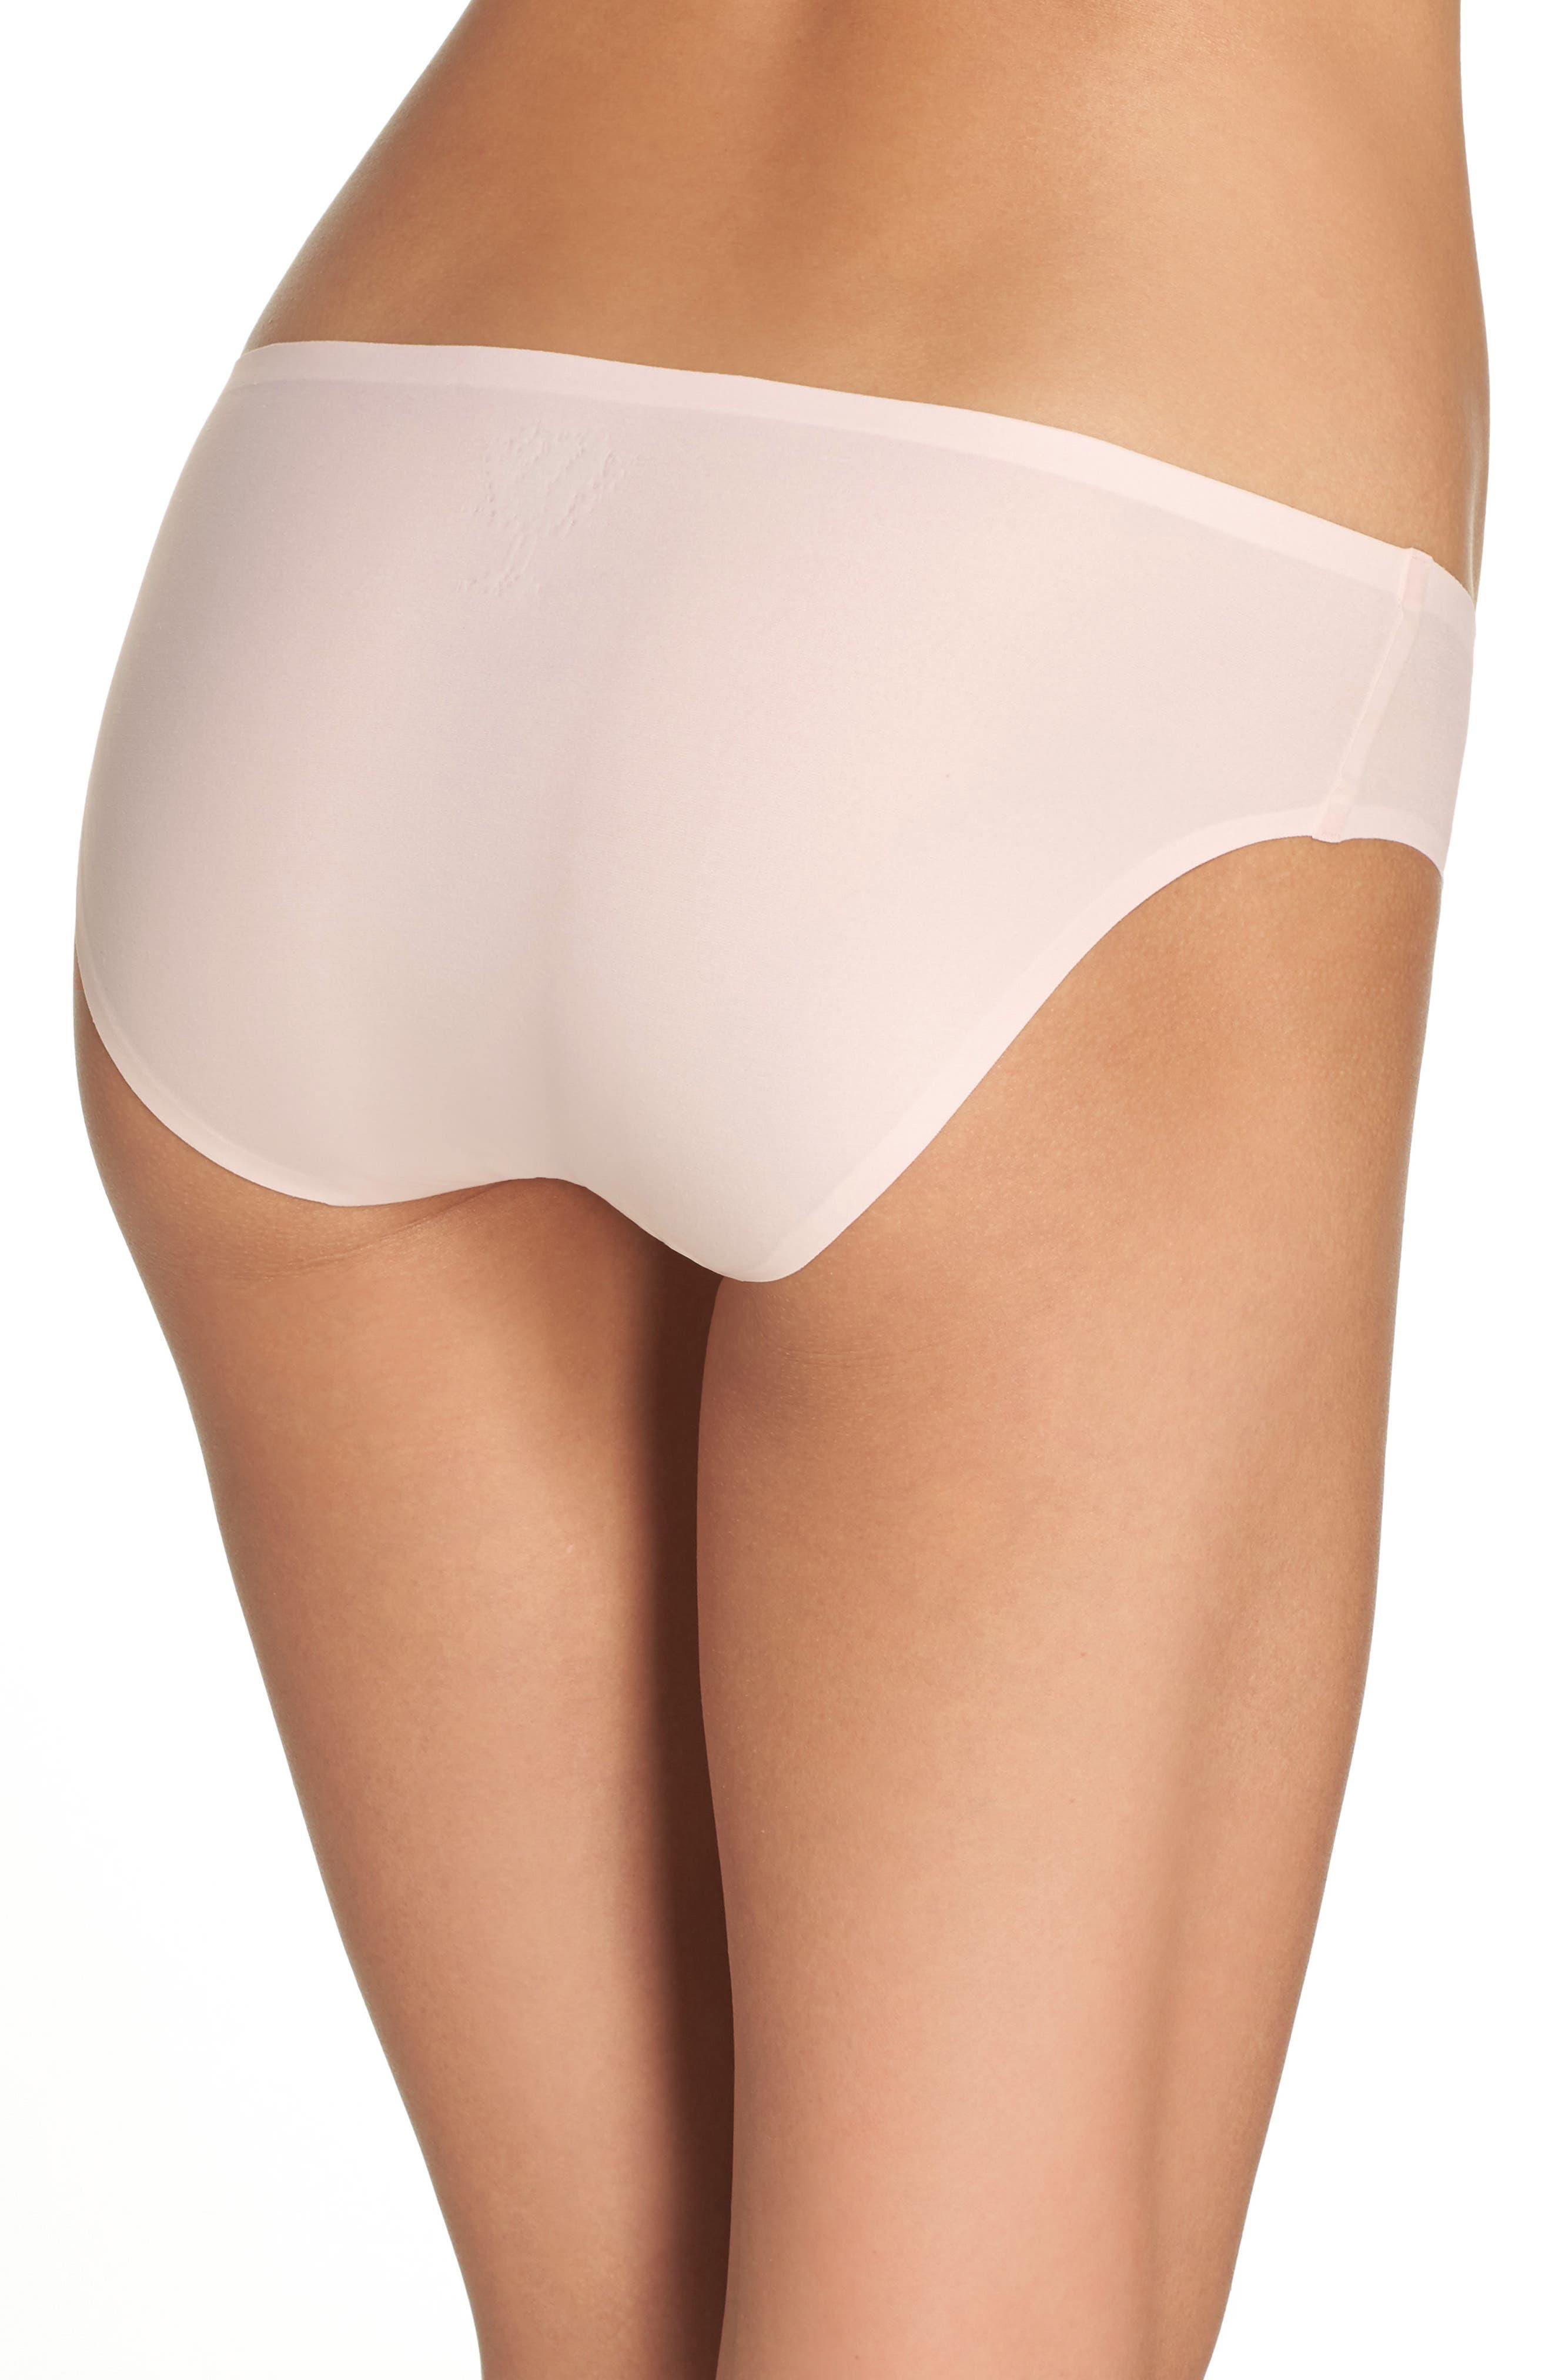 Alternate Image 2  - Chantelle Intimates Soft Stretch Seamless Bikini (3 for $45)